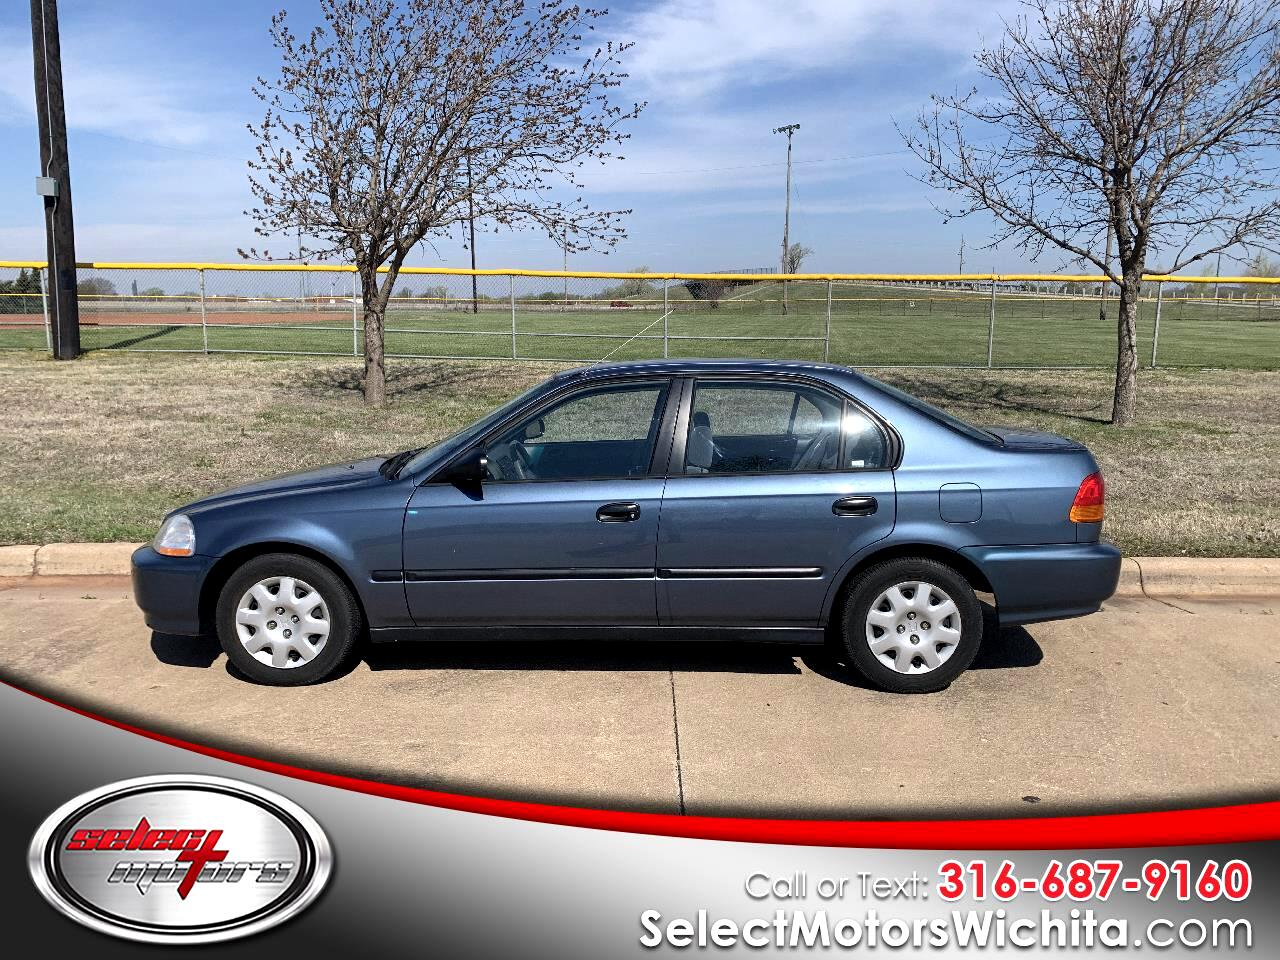 Honda Civic 4dr Sdn DX Auto 1998